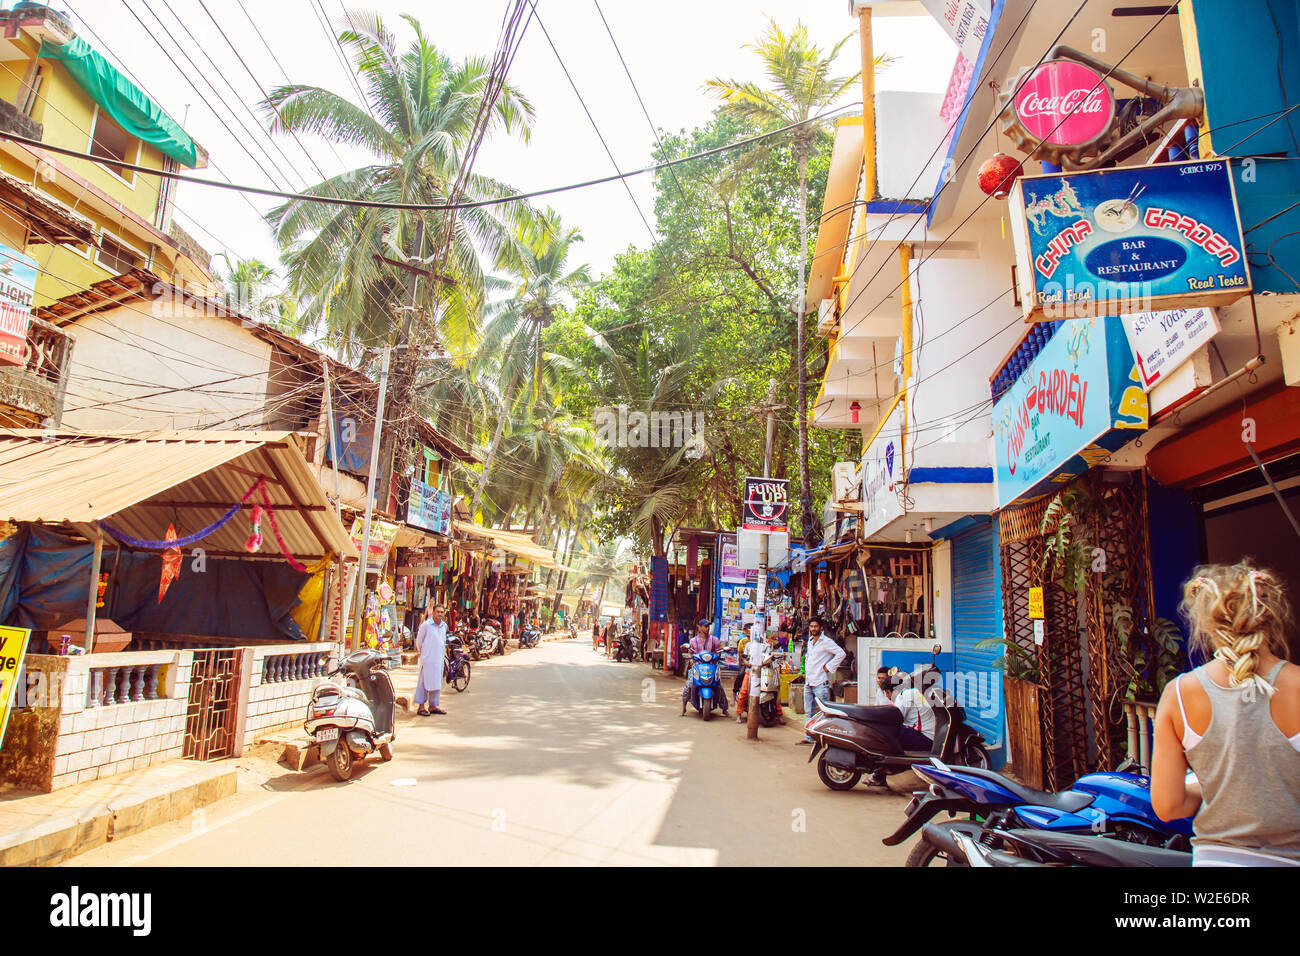 Arambol, Goa in India, February 1, 2019: Busy Street in Arambol - Stock Image